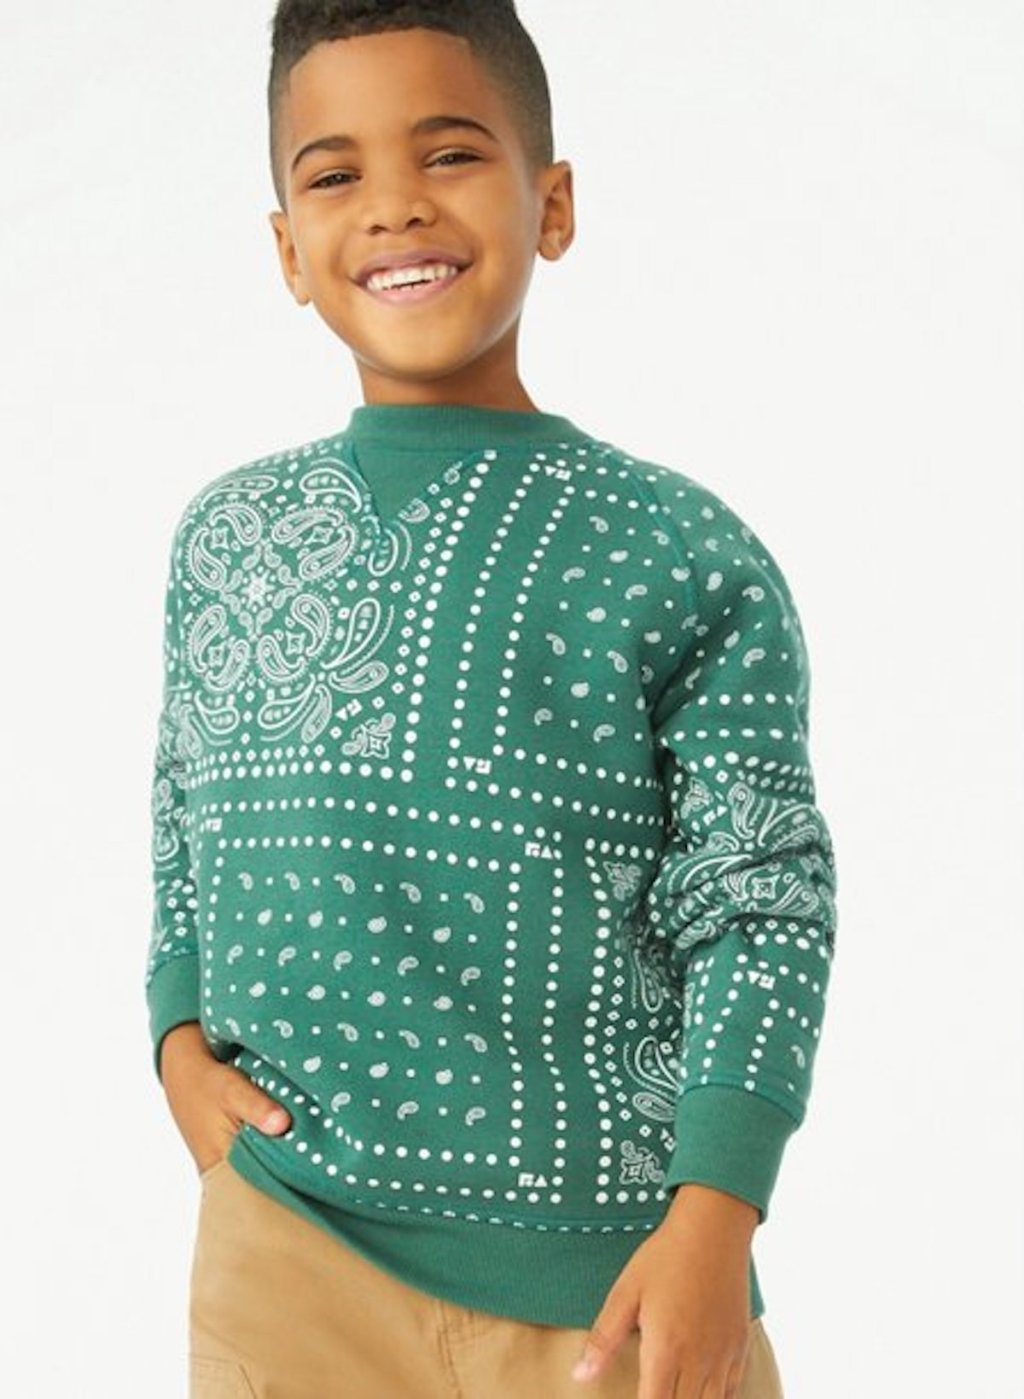 stock photo of boy wearing green sweater